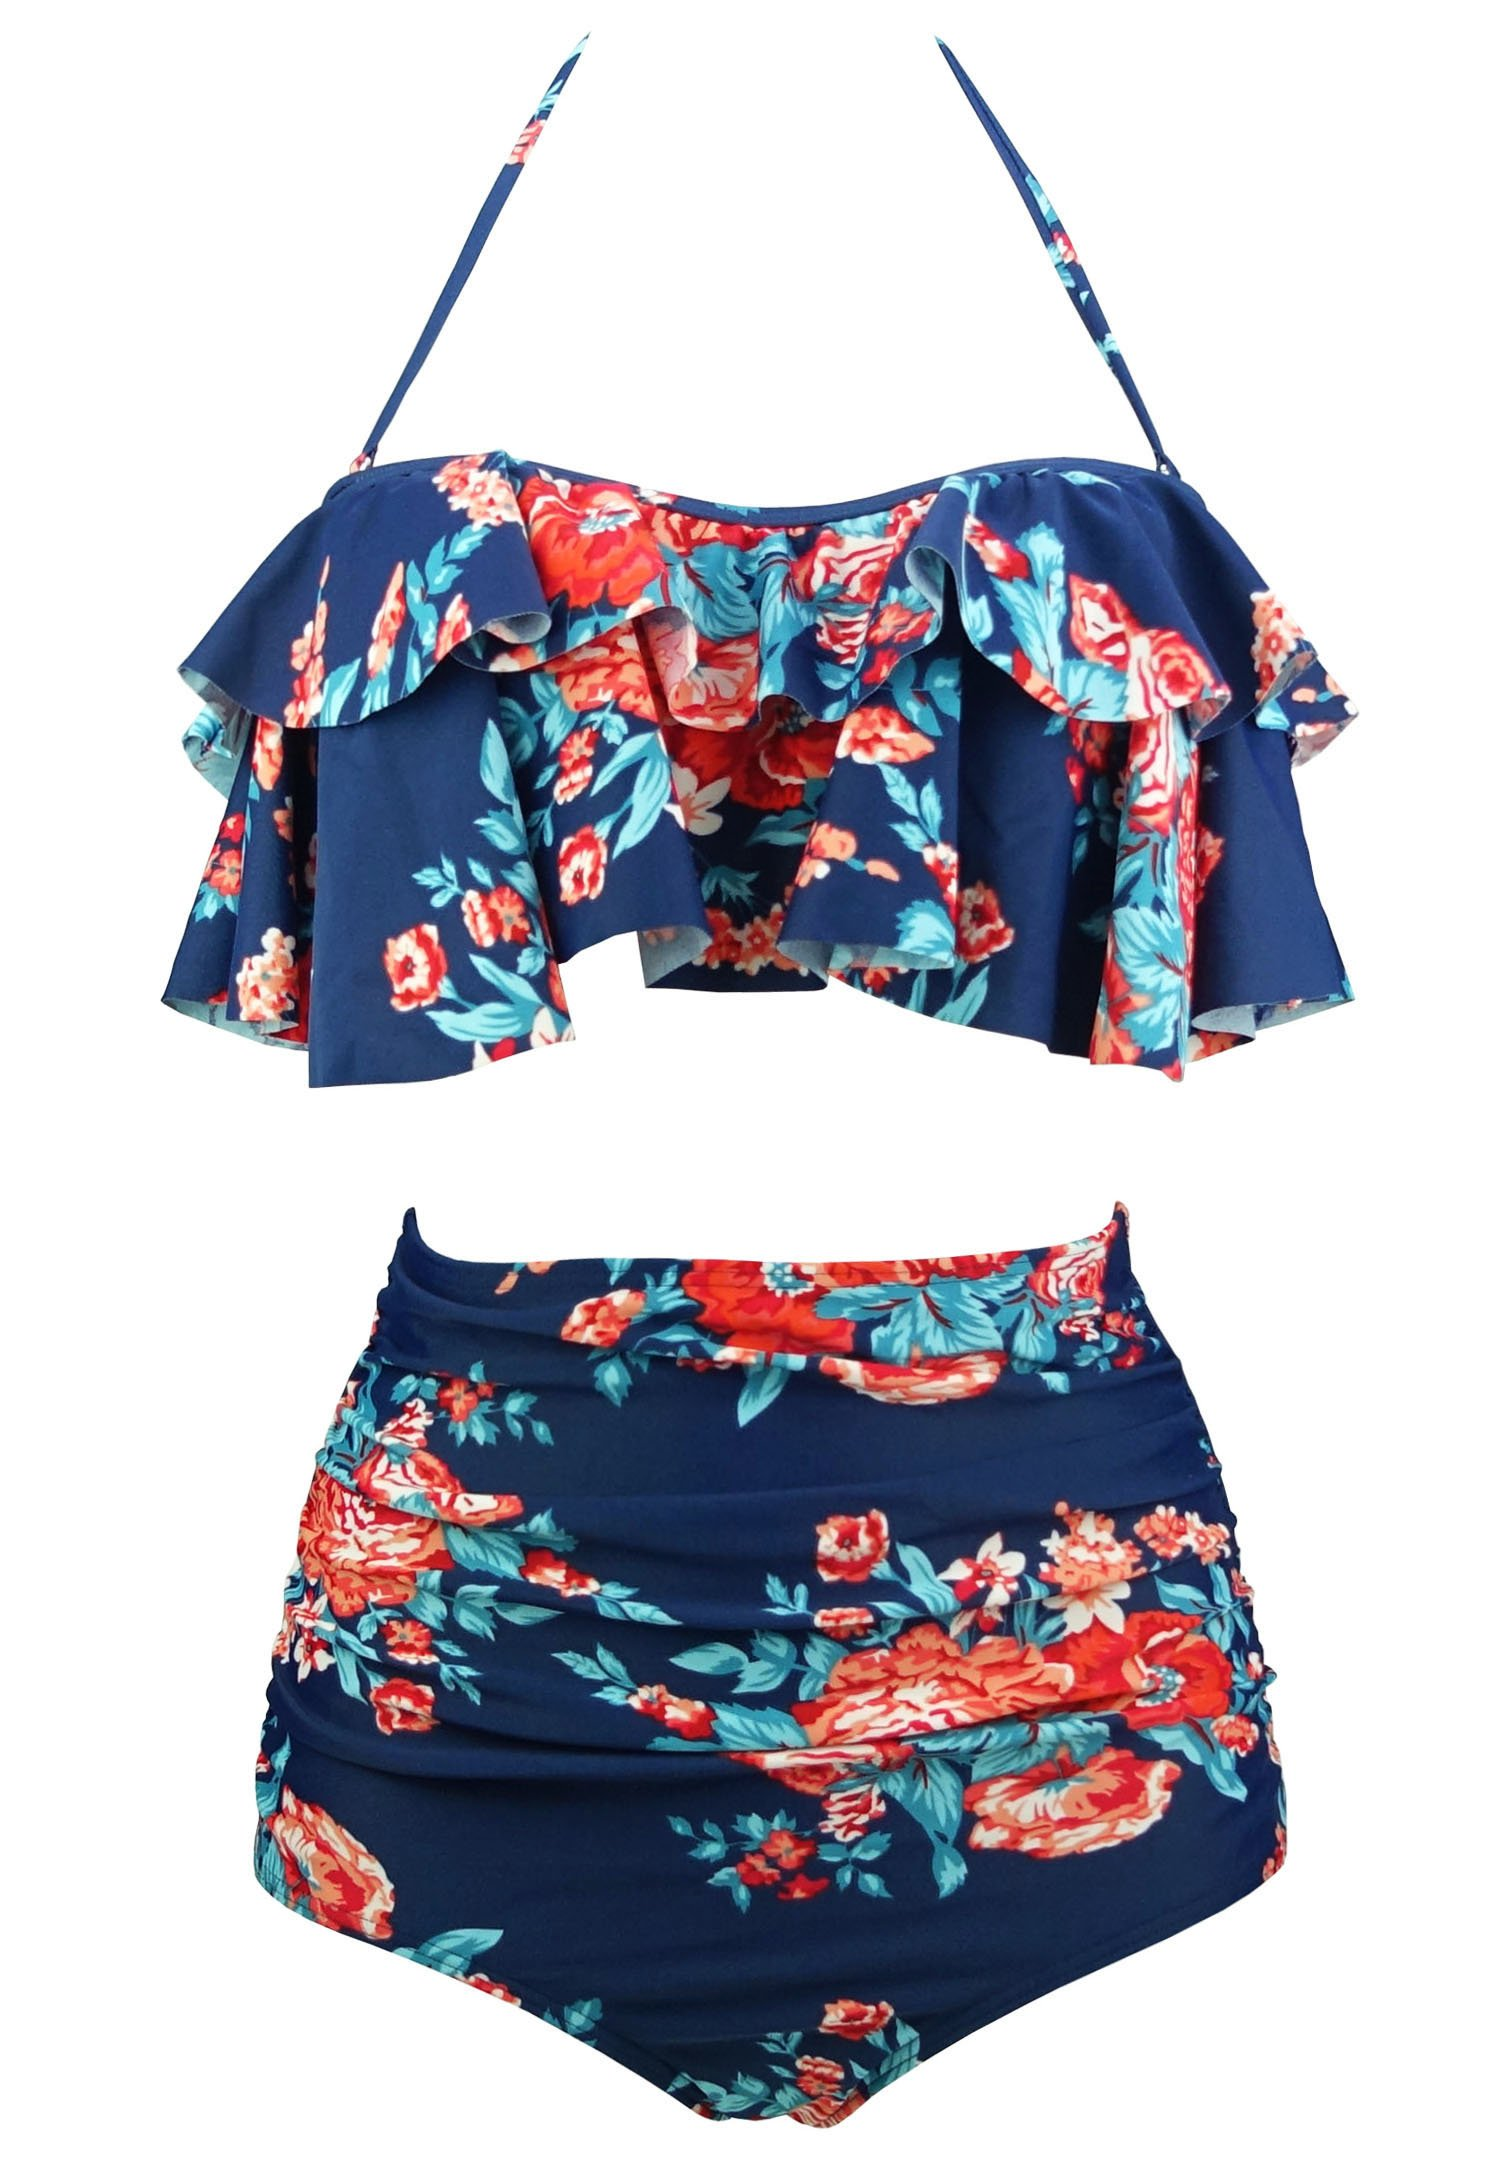 COCOSHIP Red Pink & Navy Blue Antigua Floral Retro Boho Flounce Falbala High Waist Bikini Set Chic Swimsuit Bathing Suit XL(FBA)